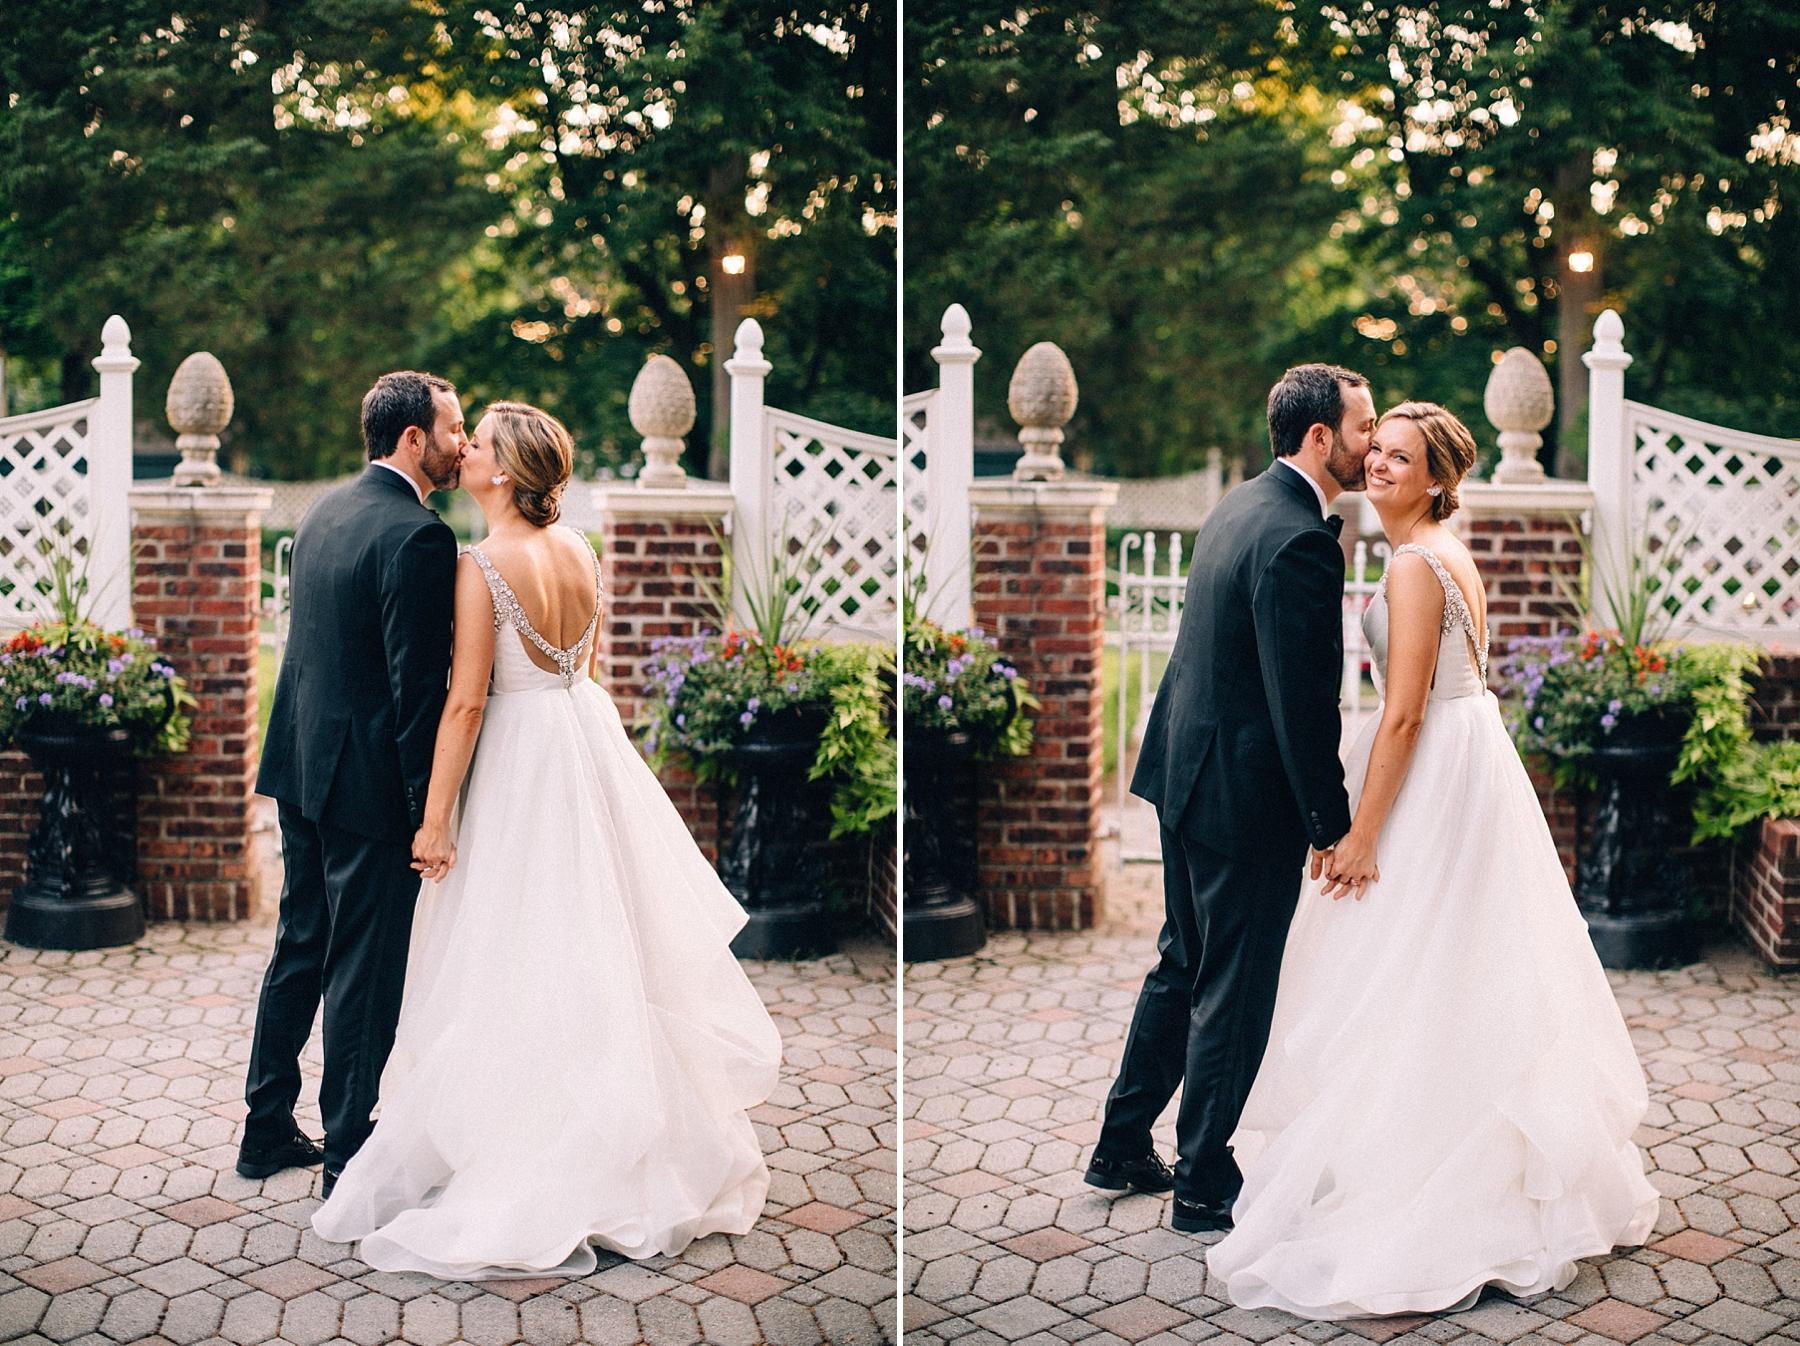 shadow_brook_nj_wedding_photographer_monmouth_county_0024.jpg